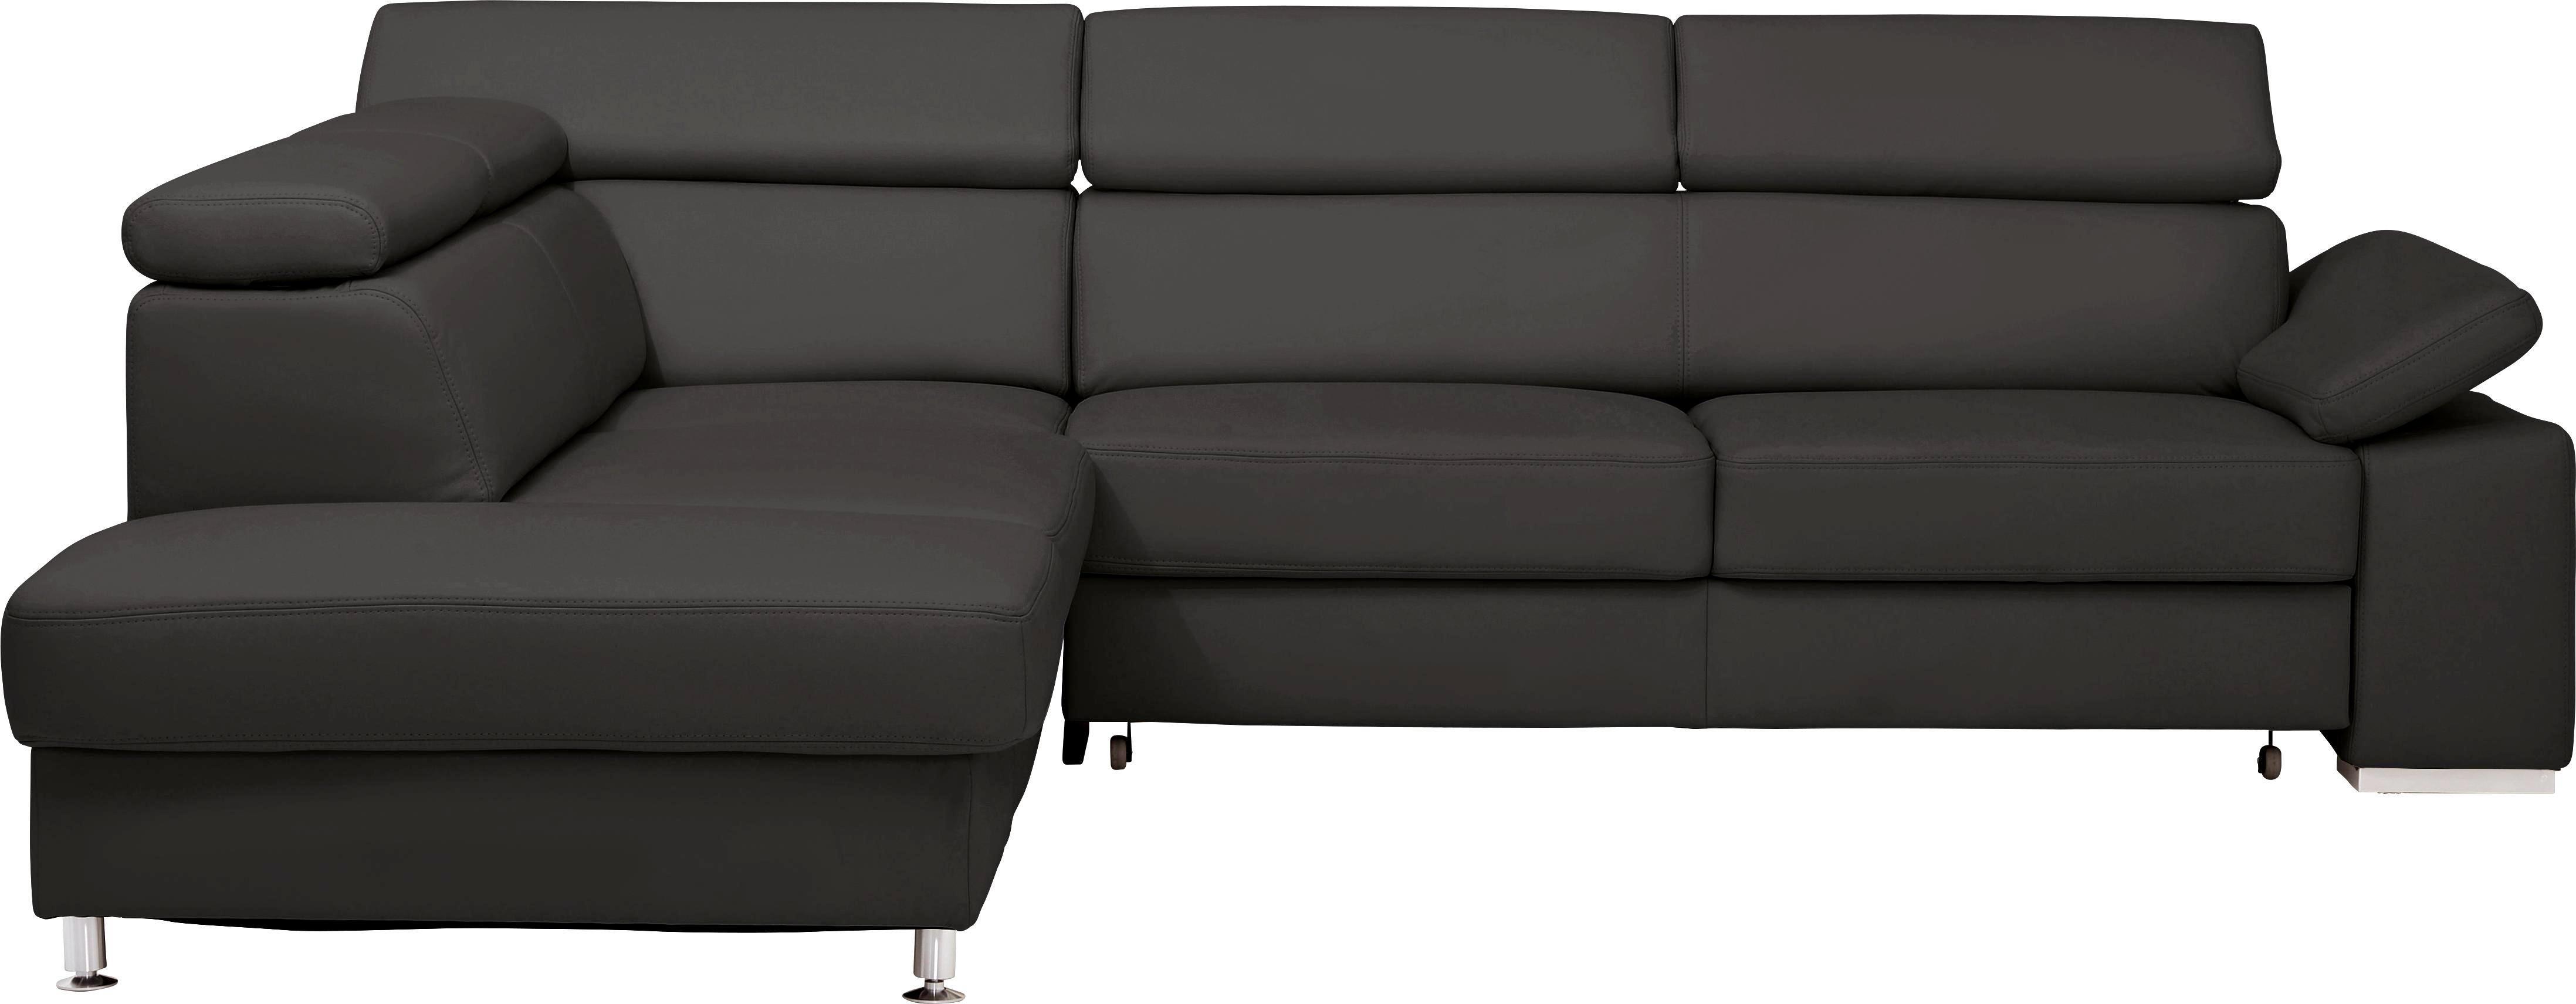 Beldomo Ecksofa Sofa Billig Beautiful Cheap Full Size Of